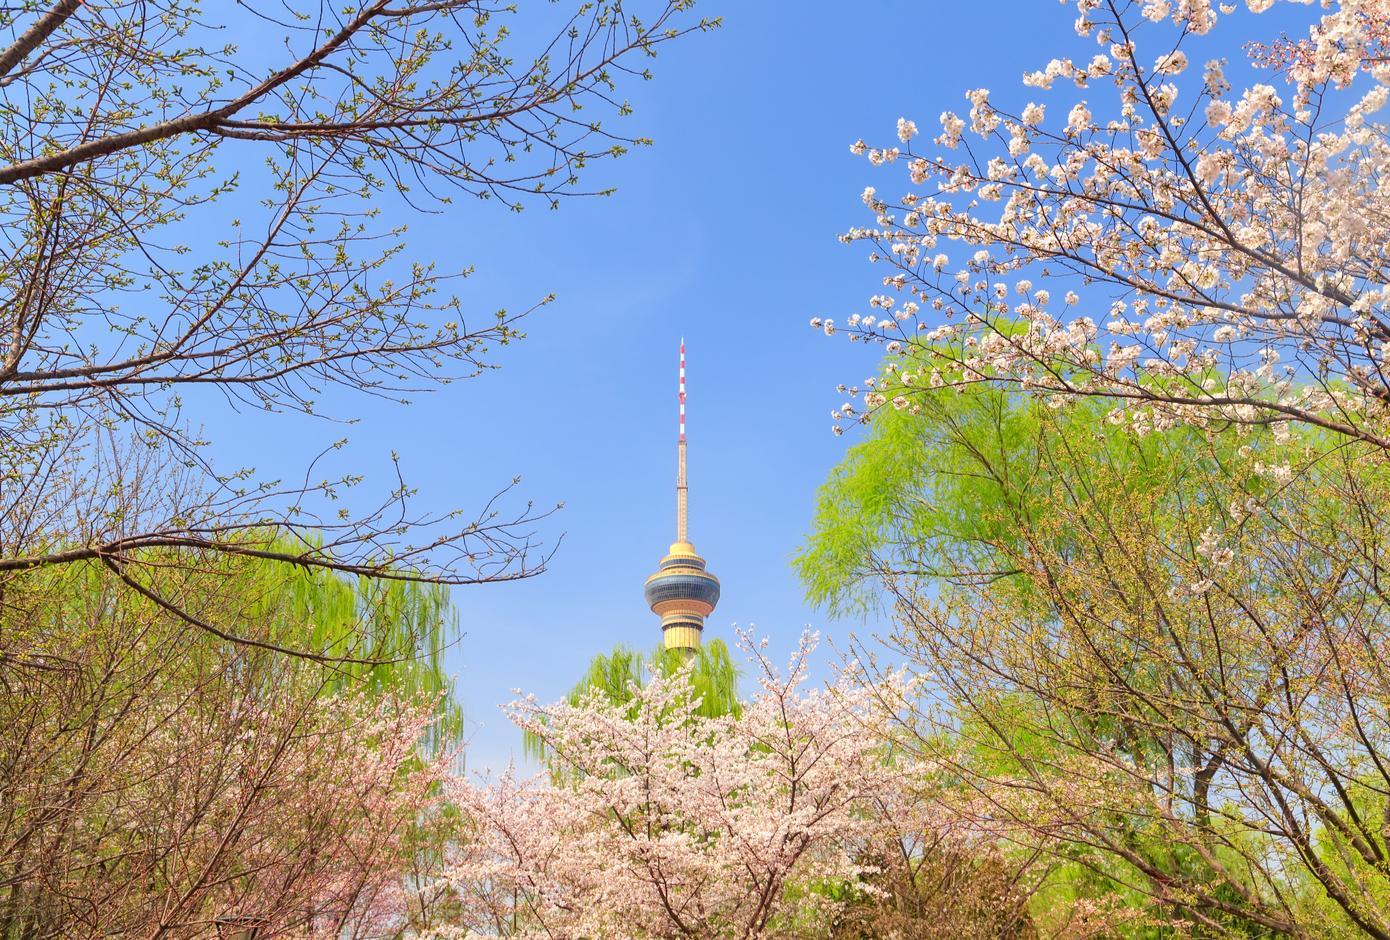 Beijing Yuyuantan Park spring scenery